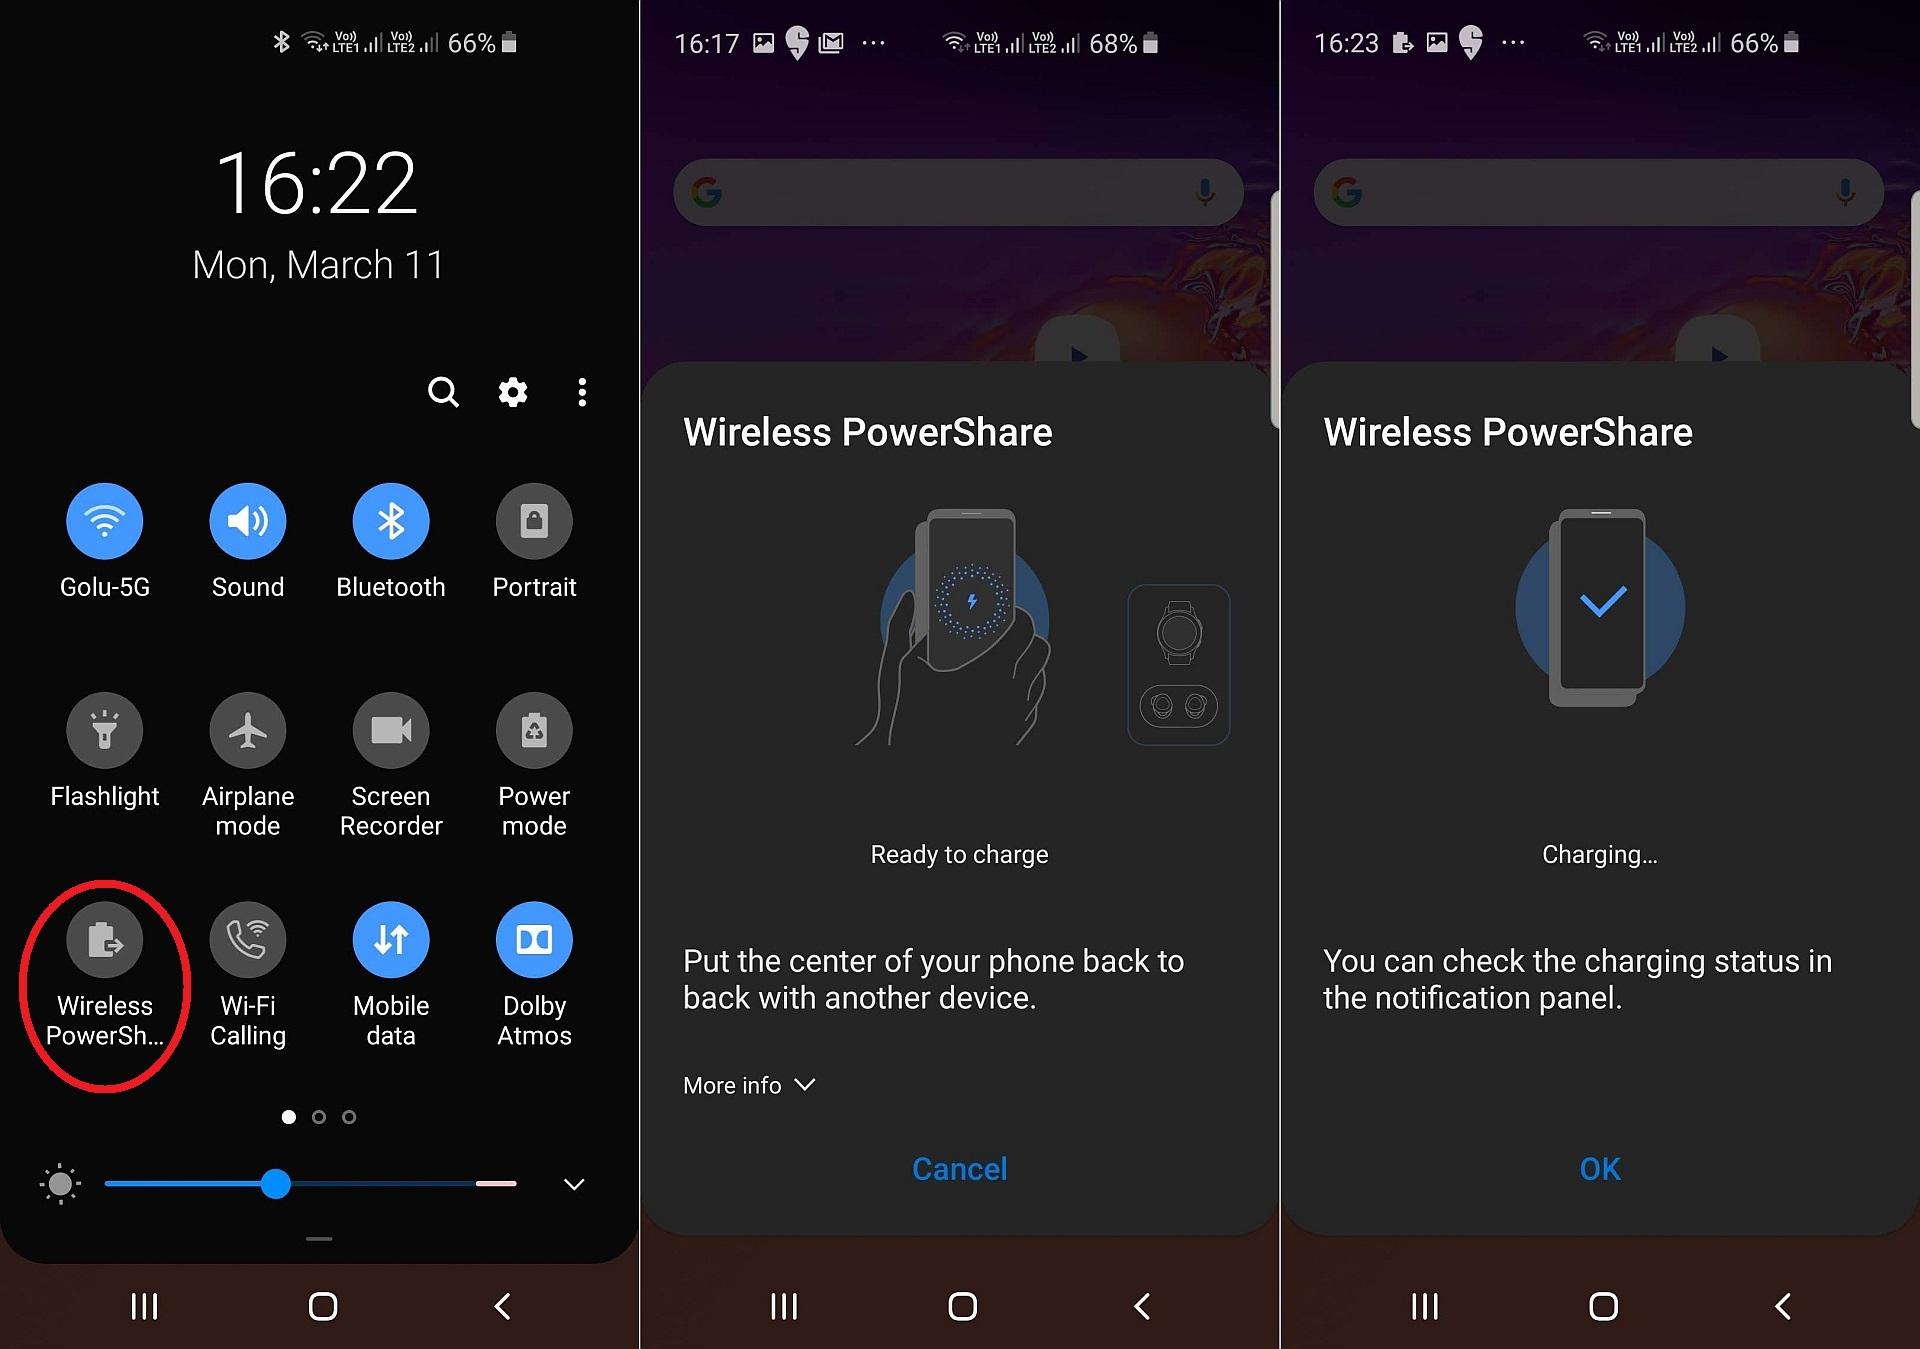 galaxy s10 wireless powershare 3